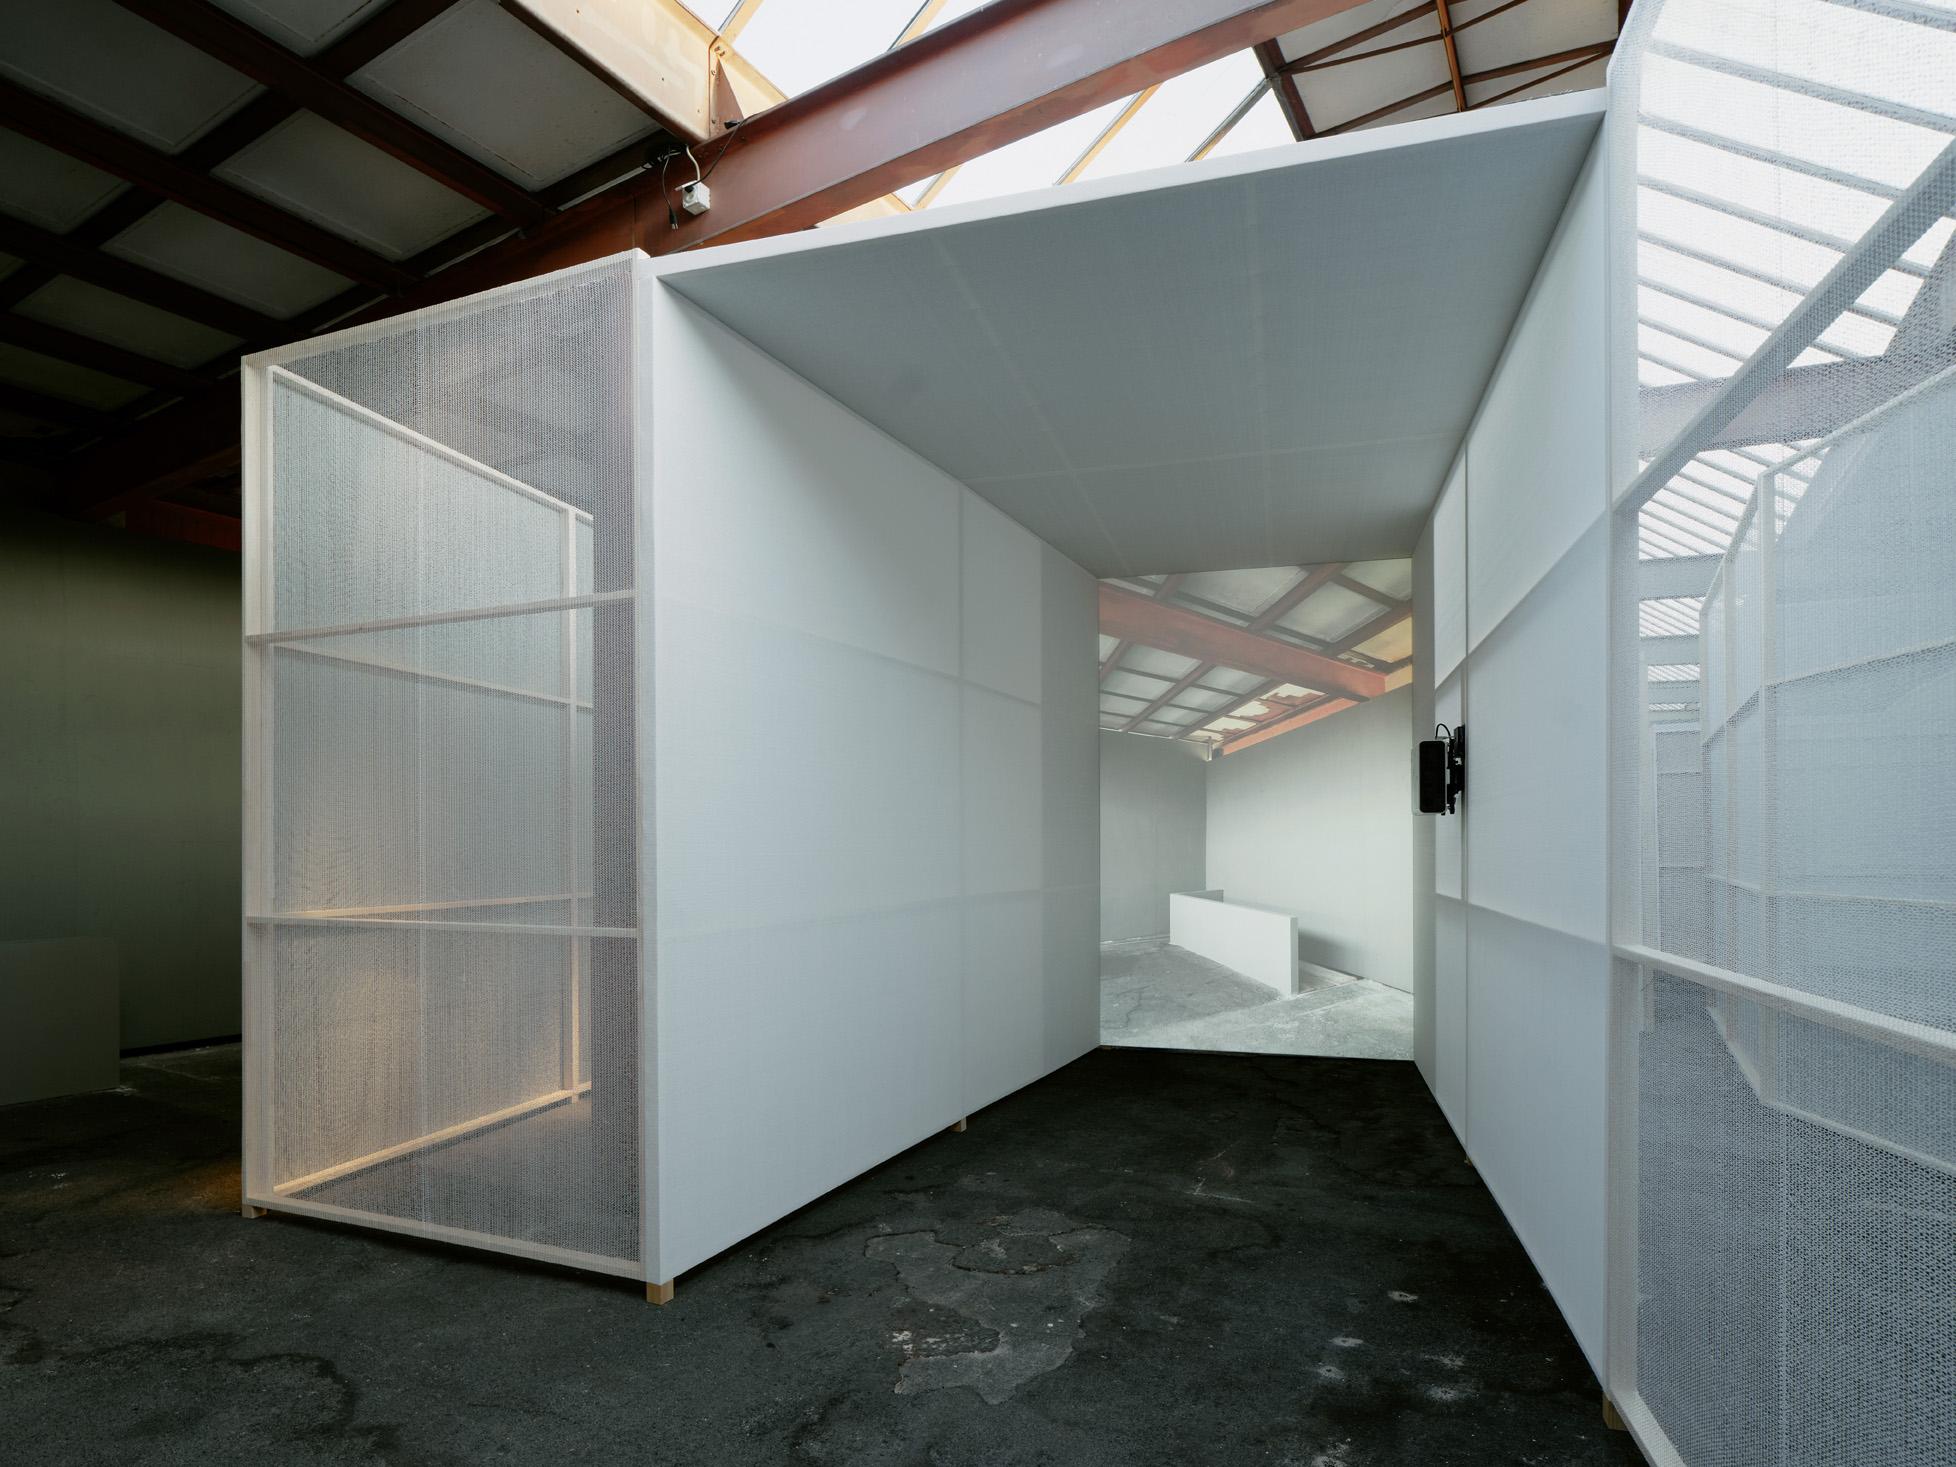 Daniel Robert Hunziker, Kunsthalle Arbon